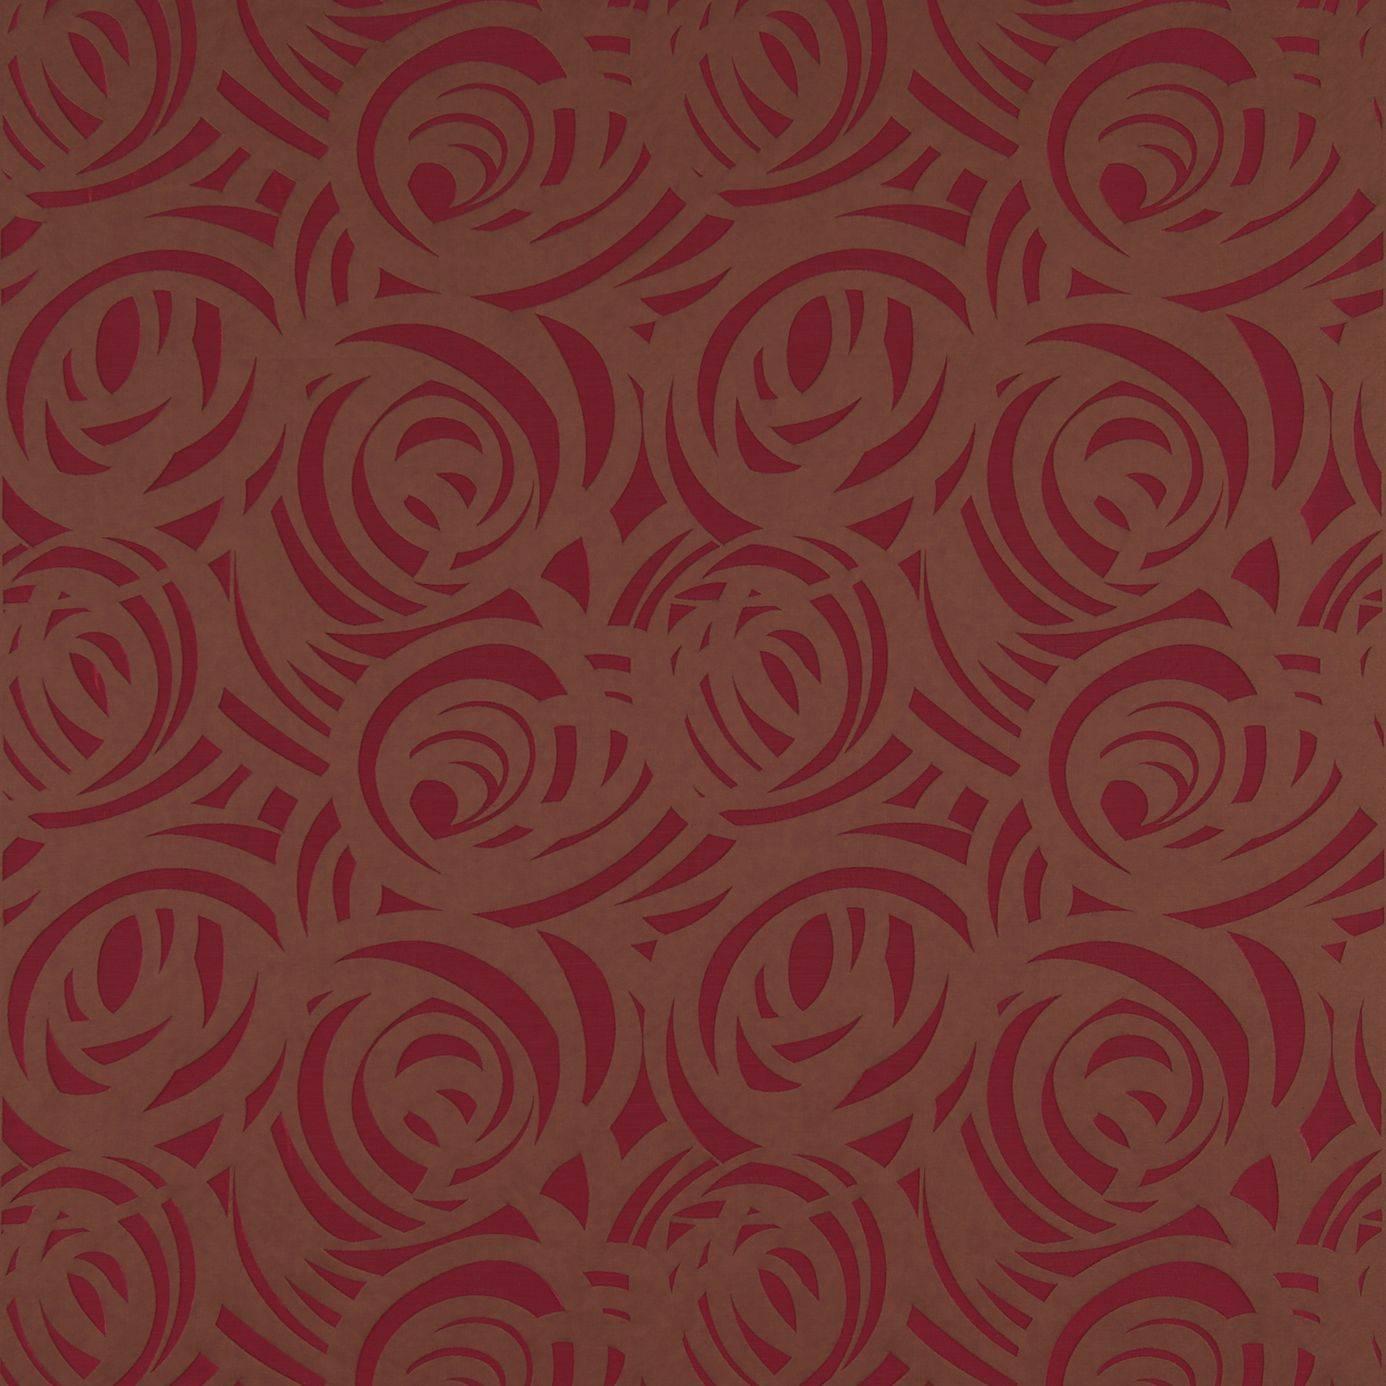 vortex momentum harlequin wallpaper